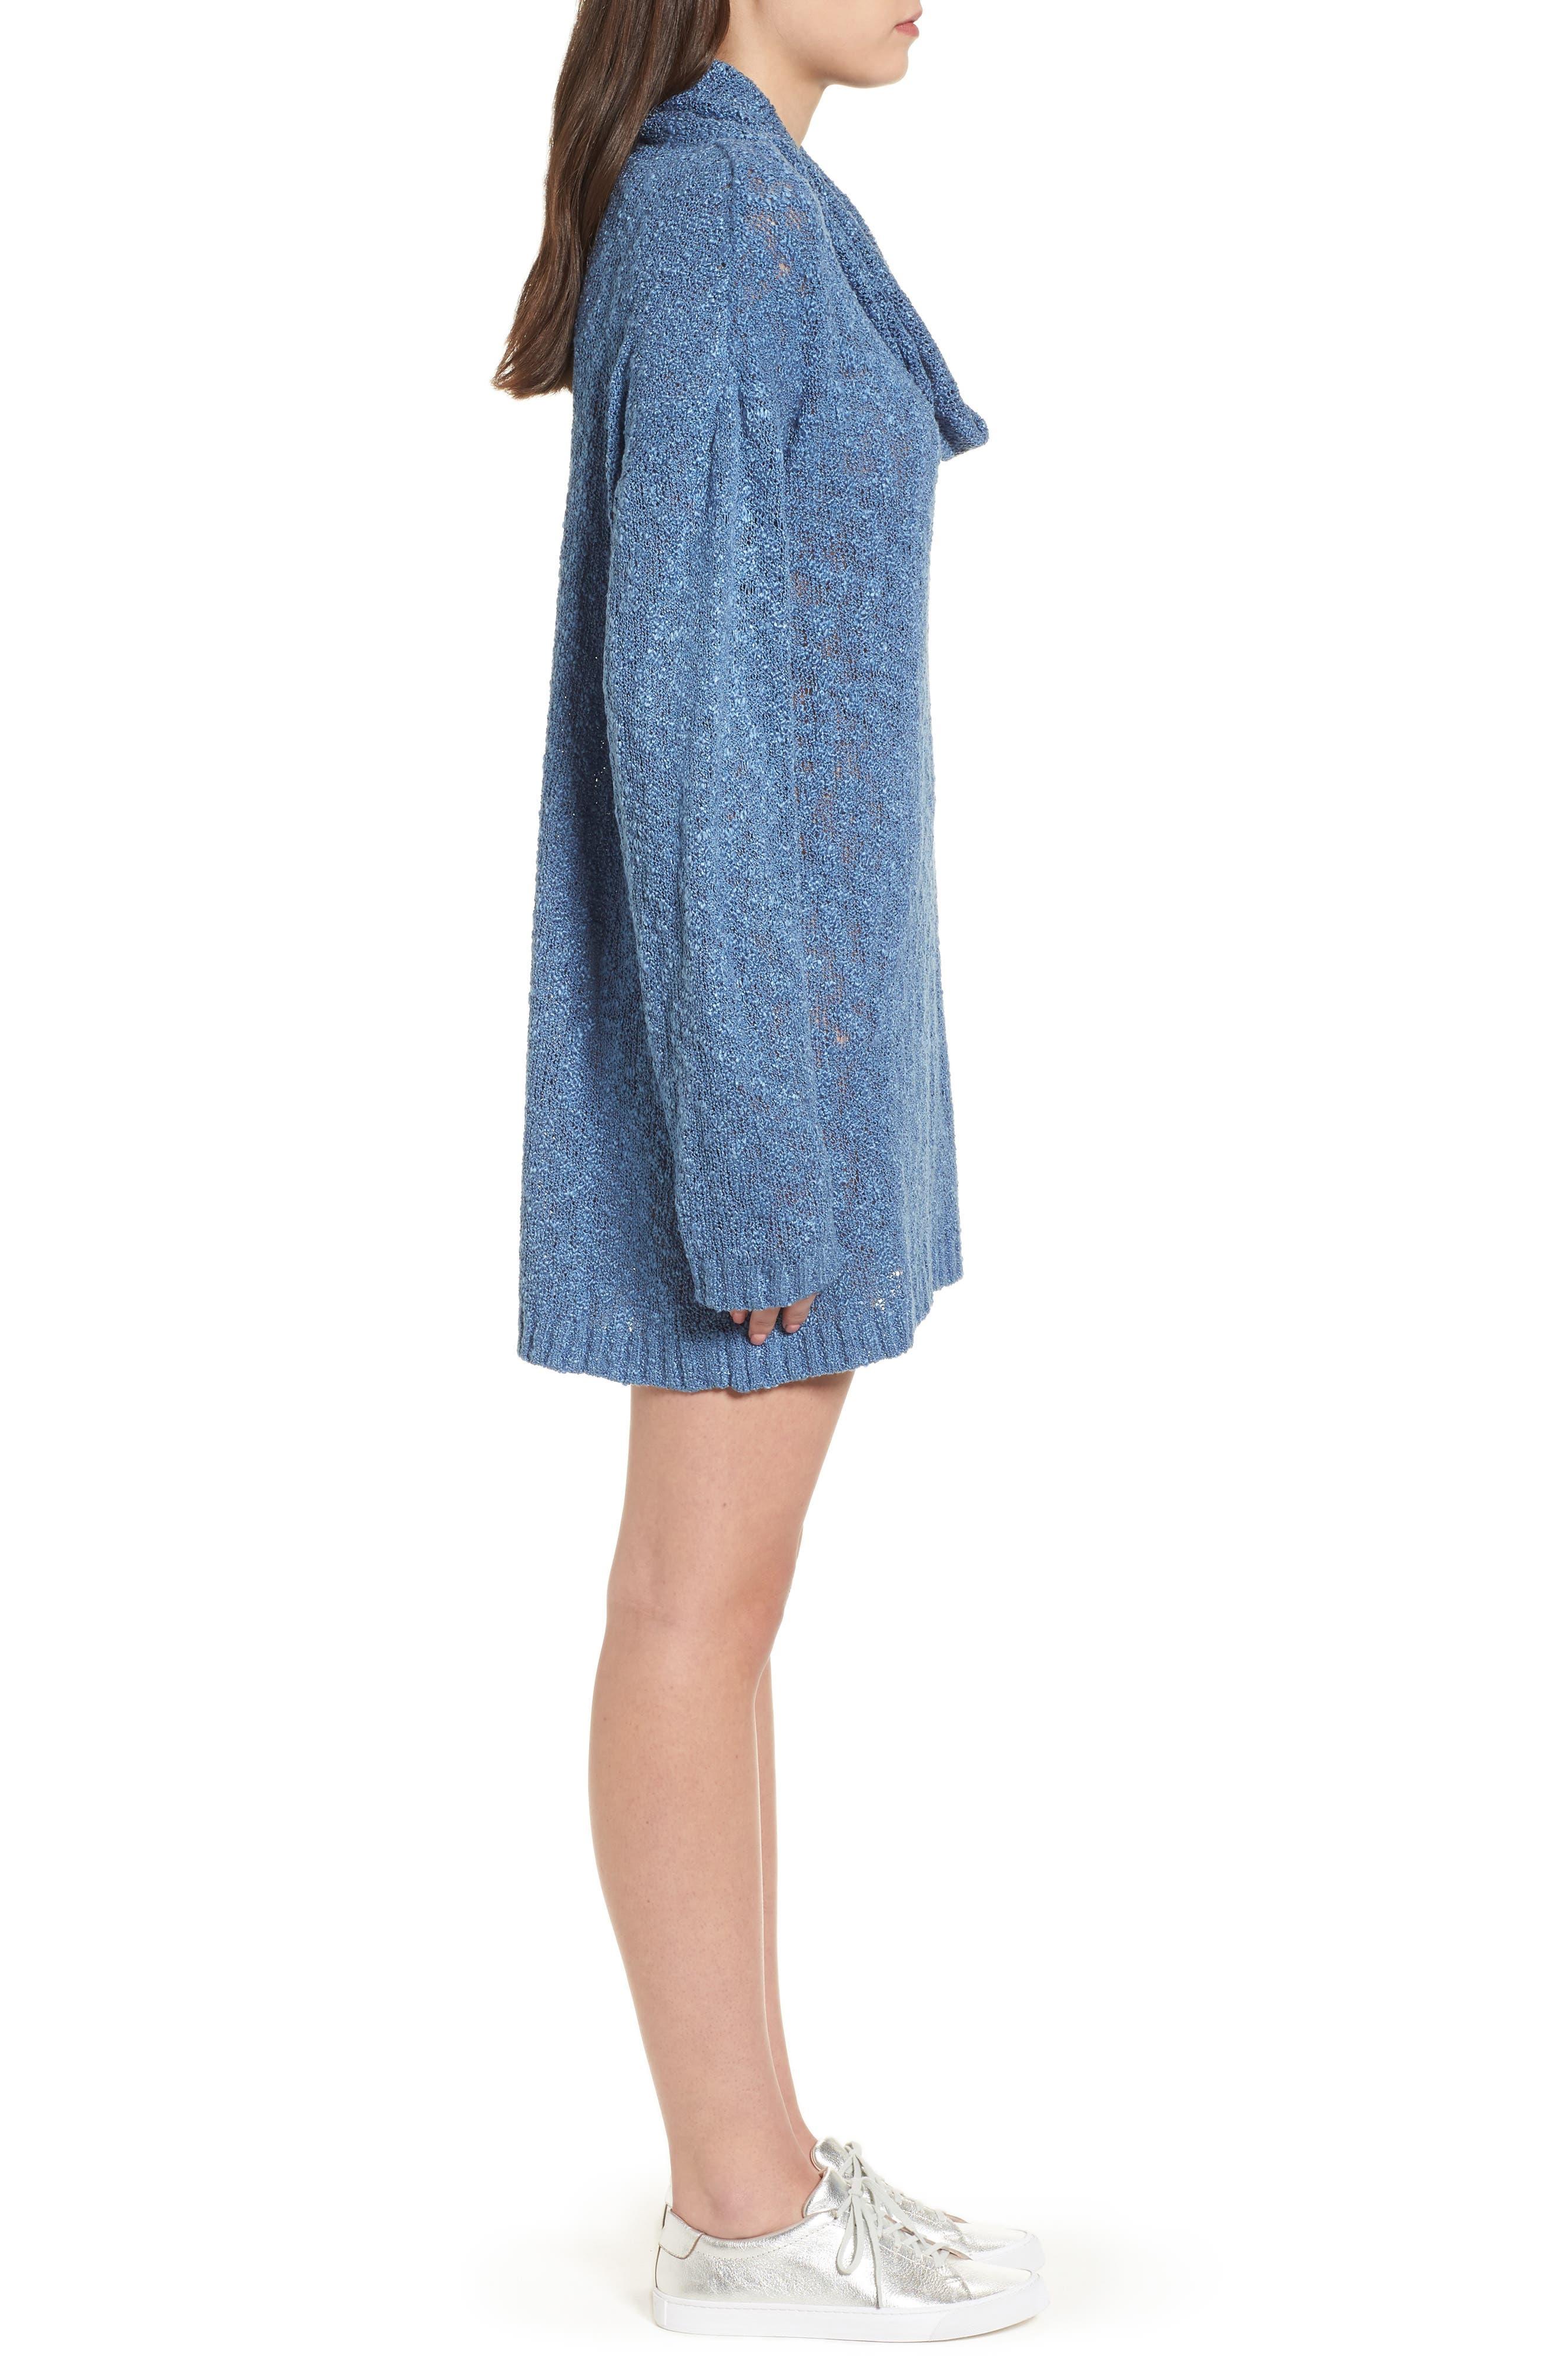 Fading Light Cowl Neck Sweater Dress,                             Alternate thumbnail 3, color,                             401